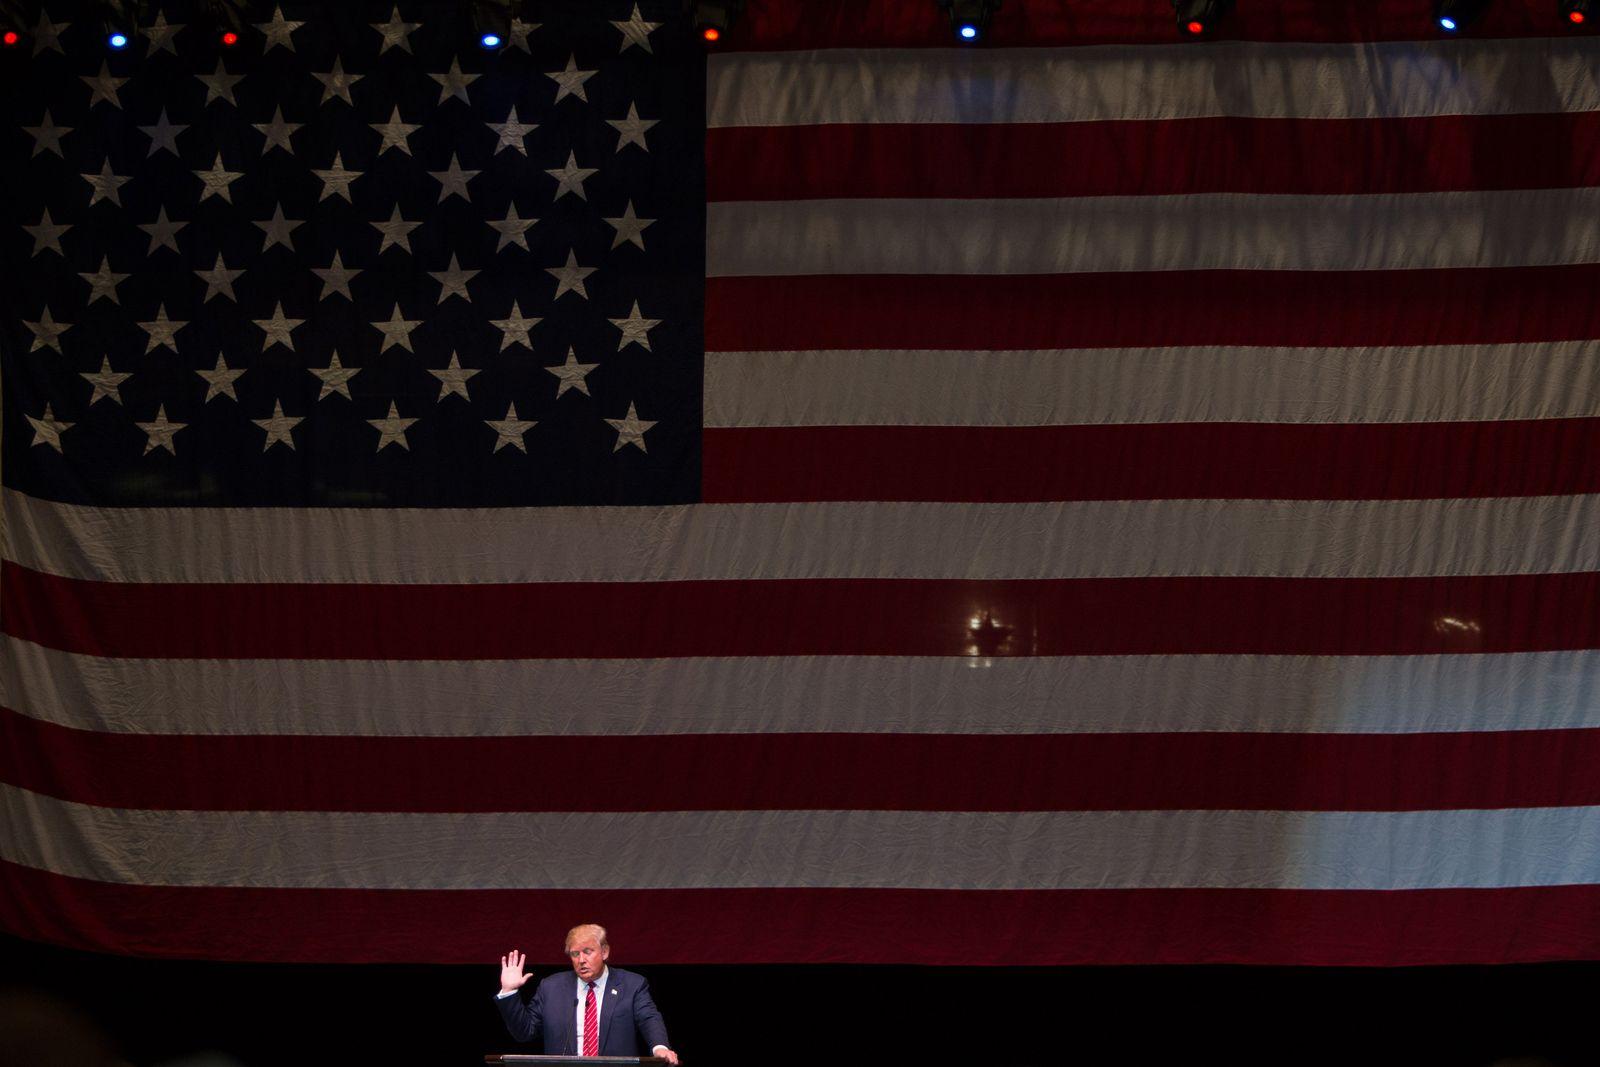 Trump/USA